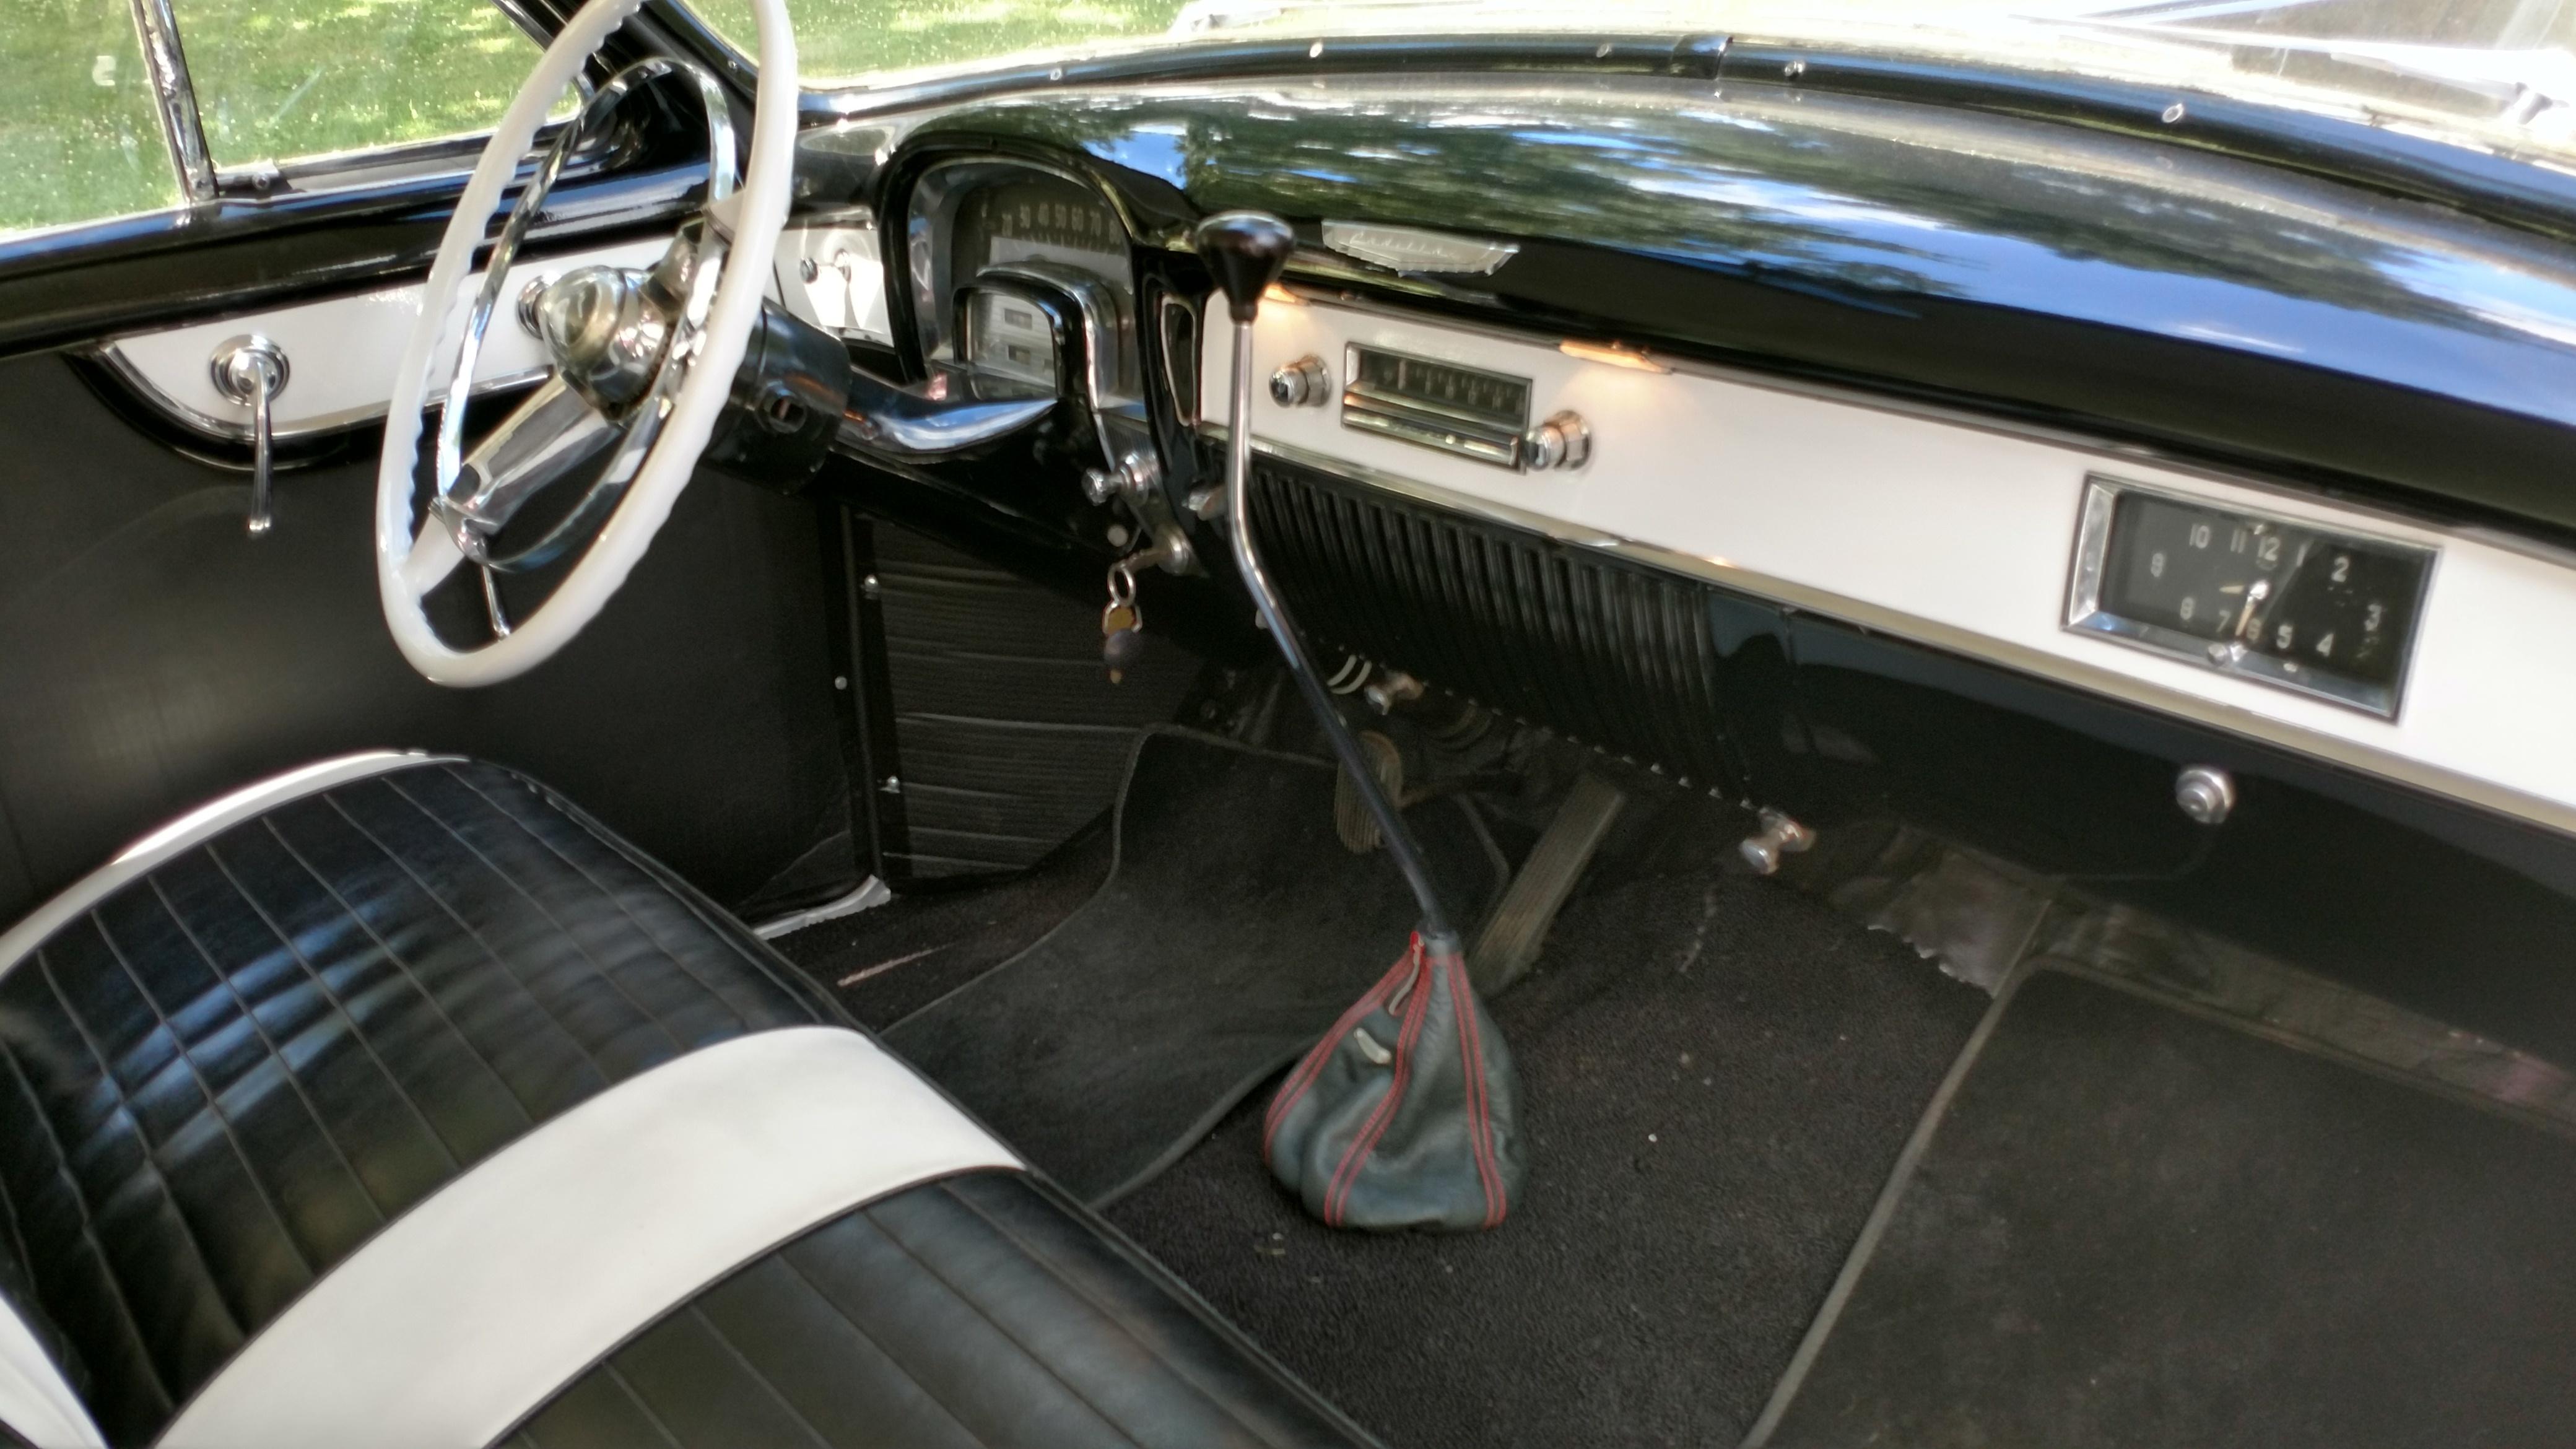 1951 Cadillac 62 Series Gaa Classic Cars Sedan Chevrolet Drive Train 350 Cid Engine